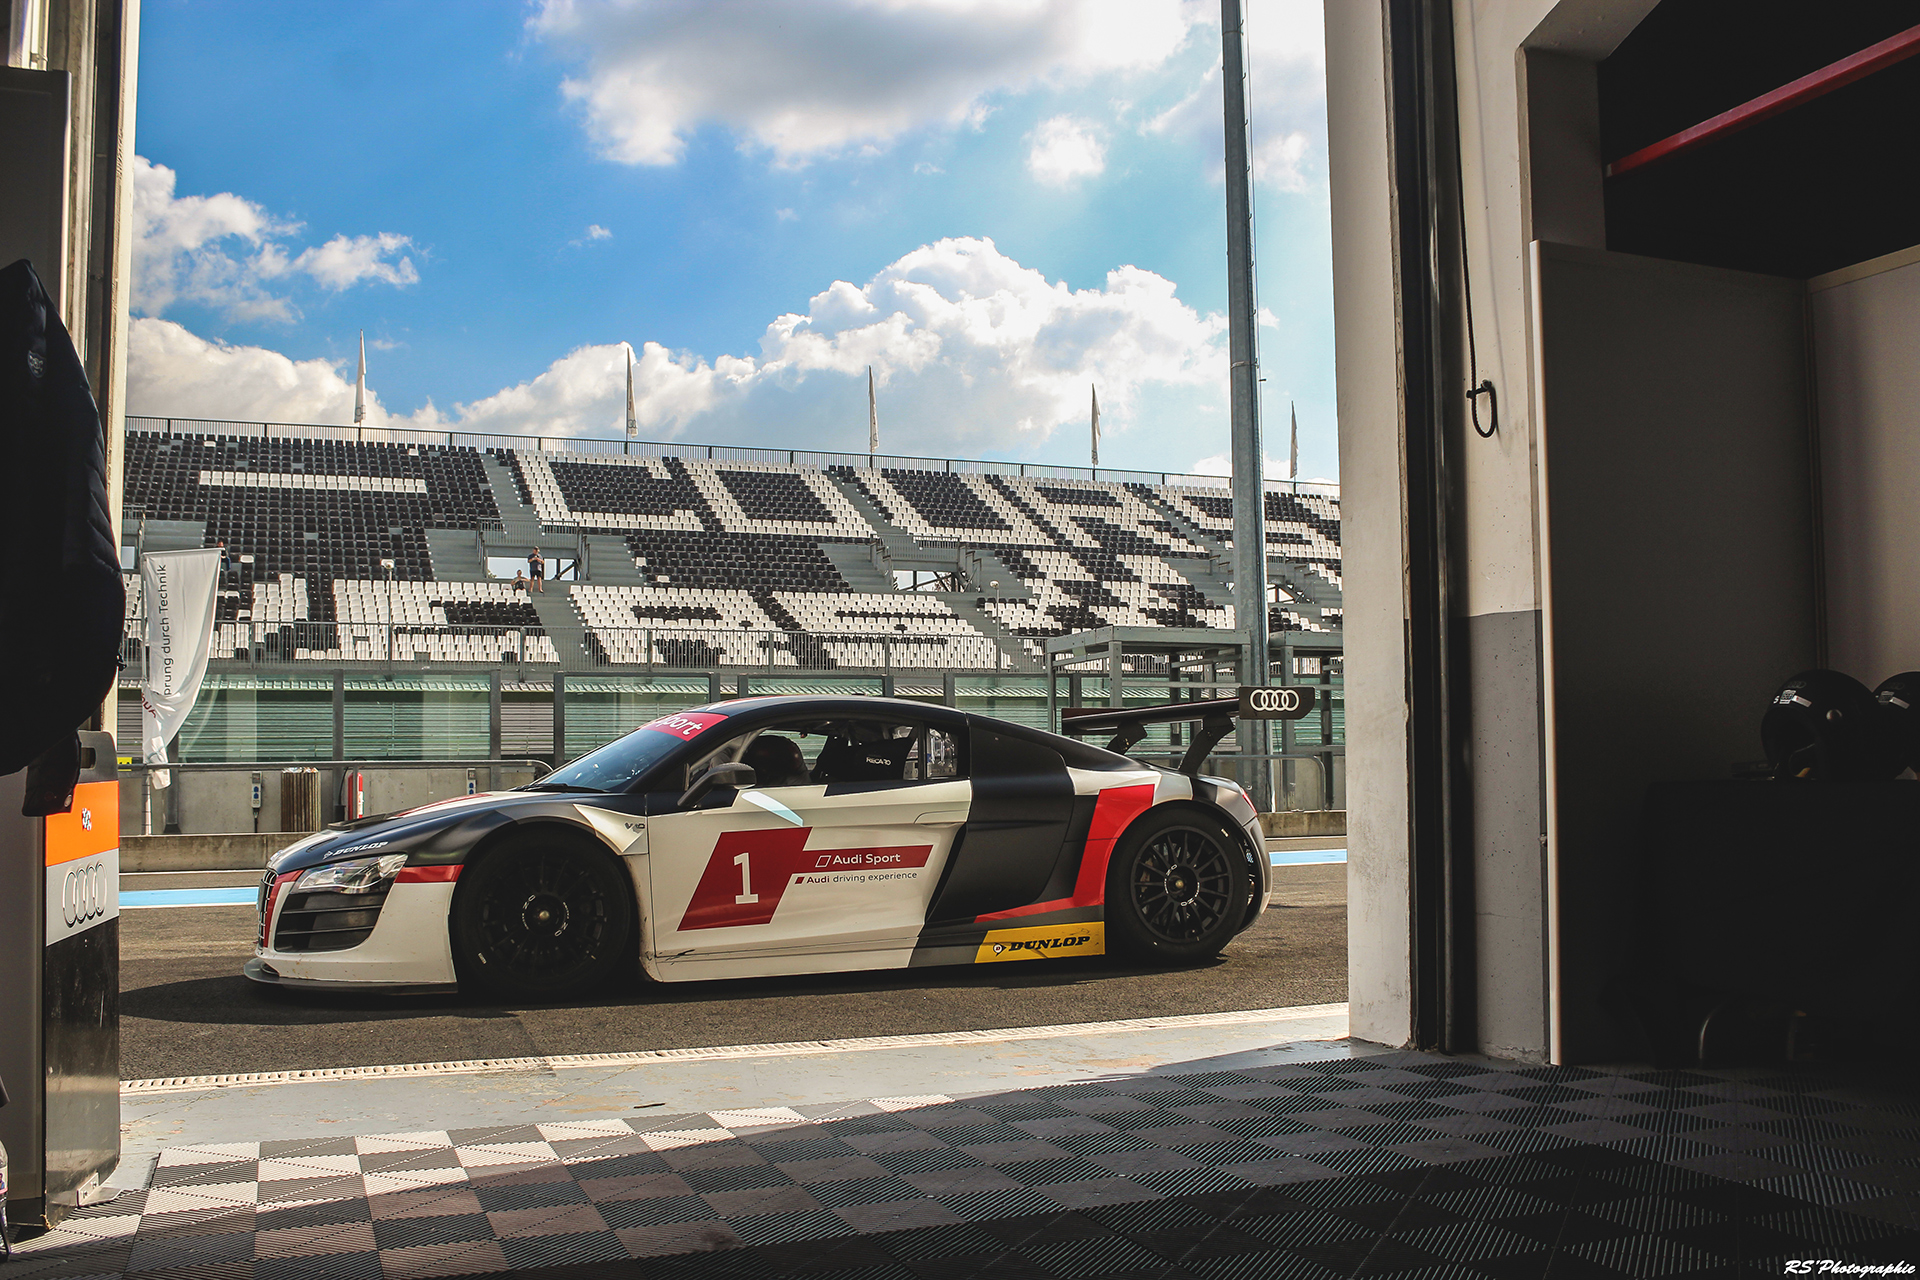 Audi R8 LMS GT3 -pitlane - profil / side-face - photo Arnaud Demasier